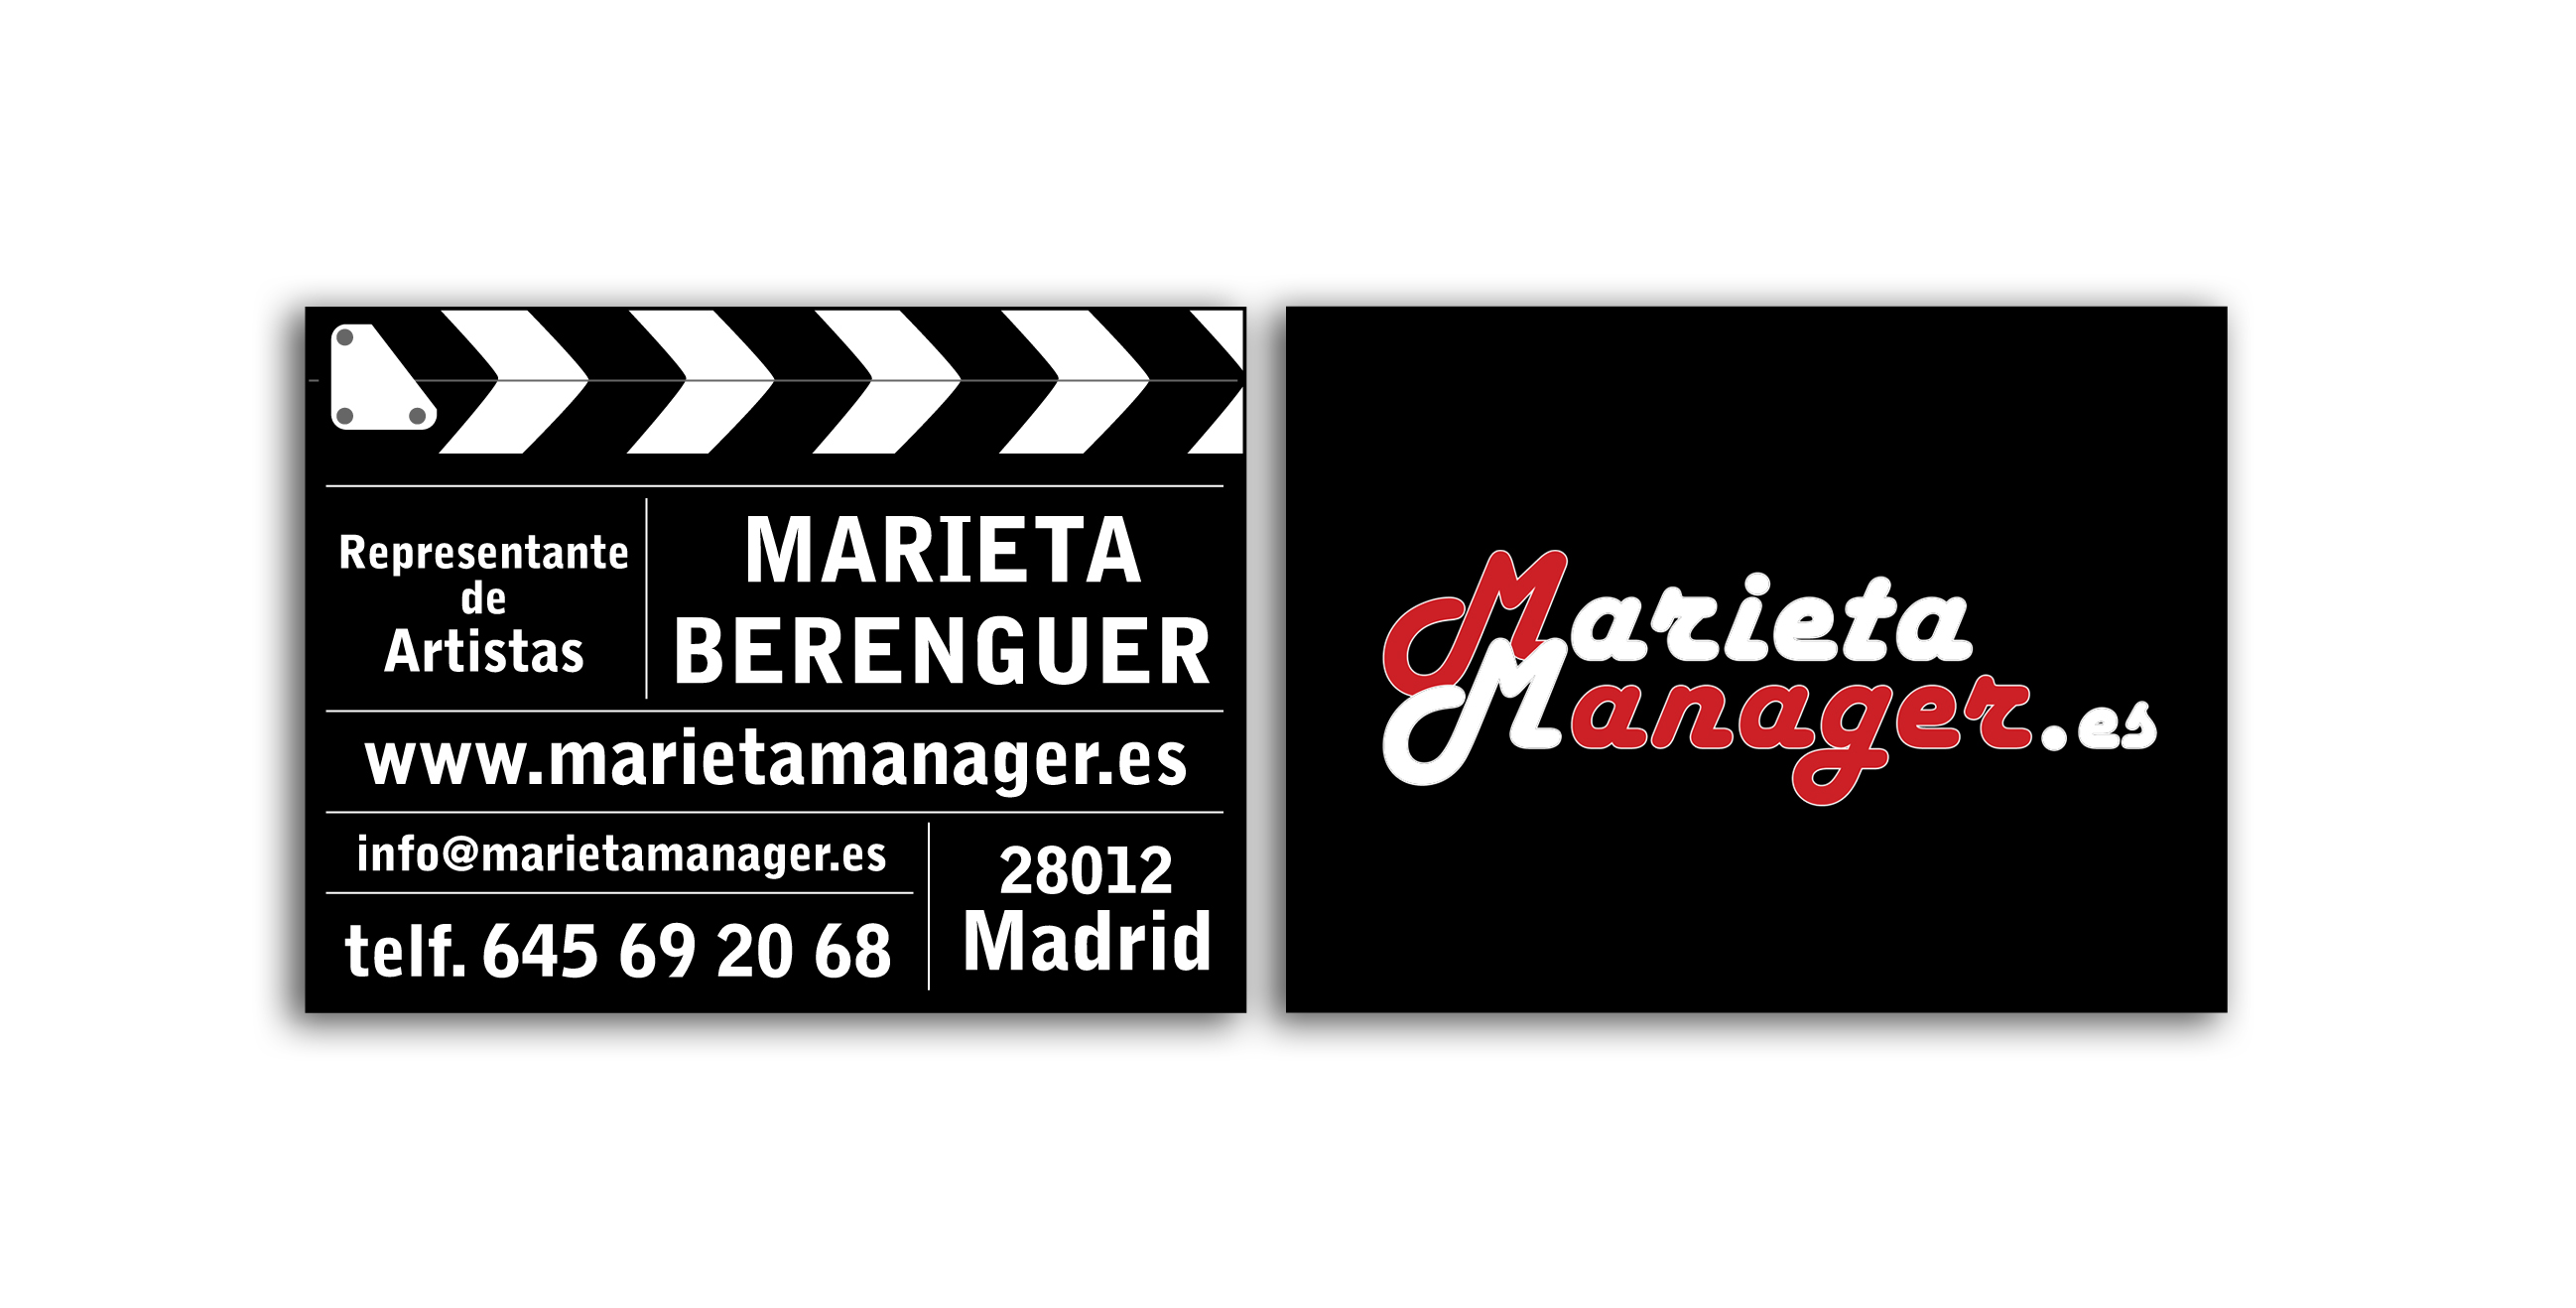 aaff Tarjeta Marieta Berenguer